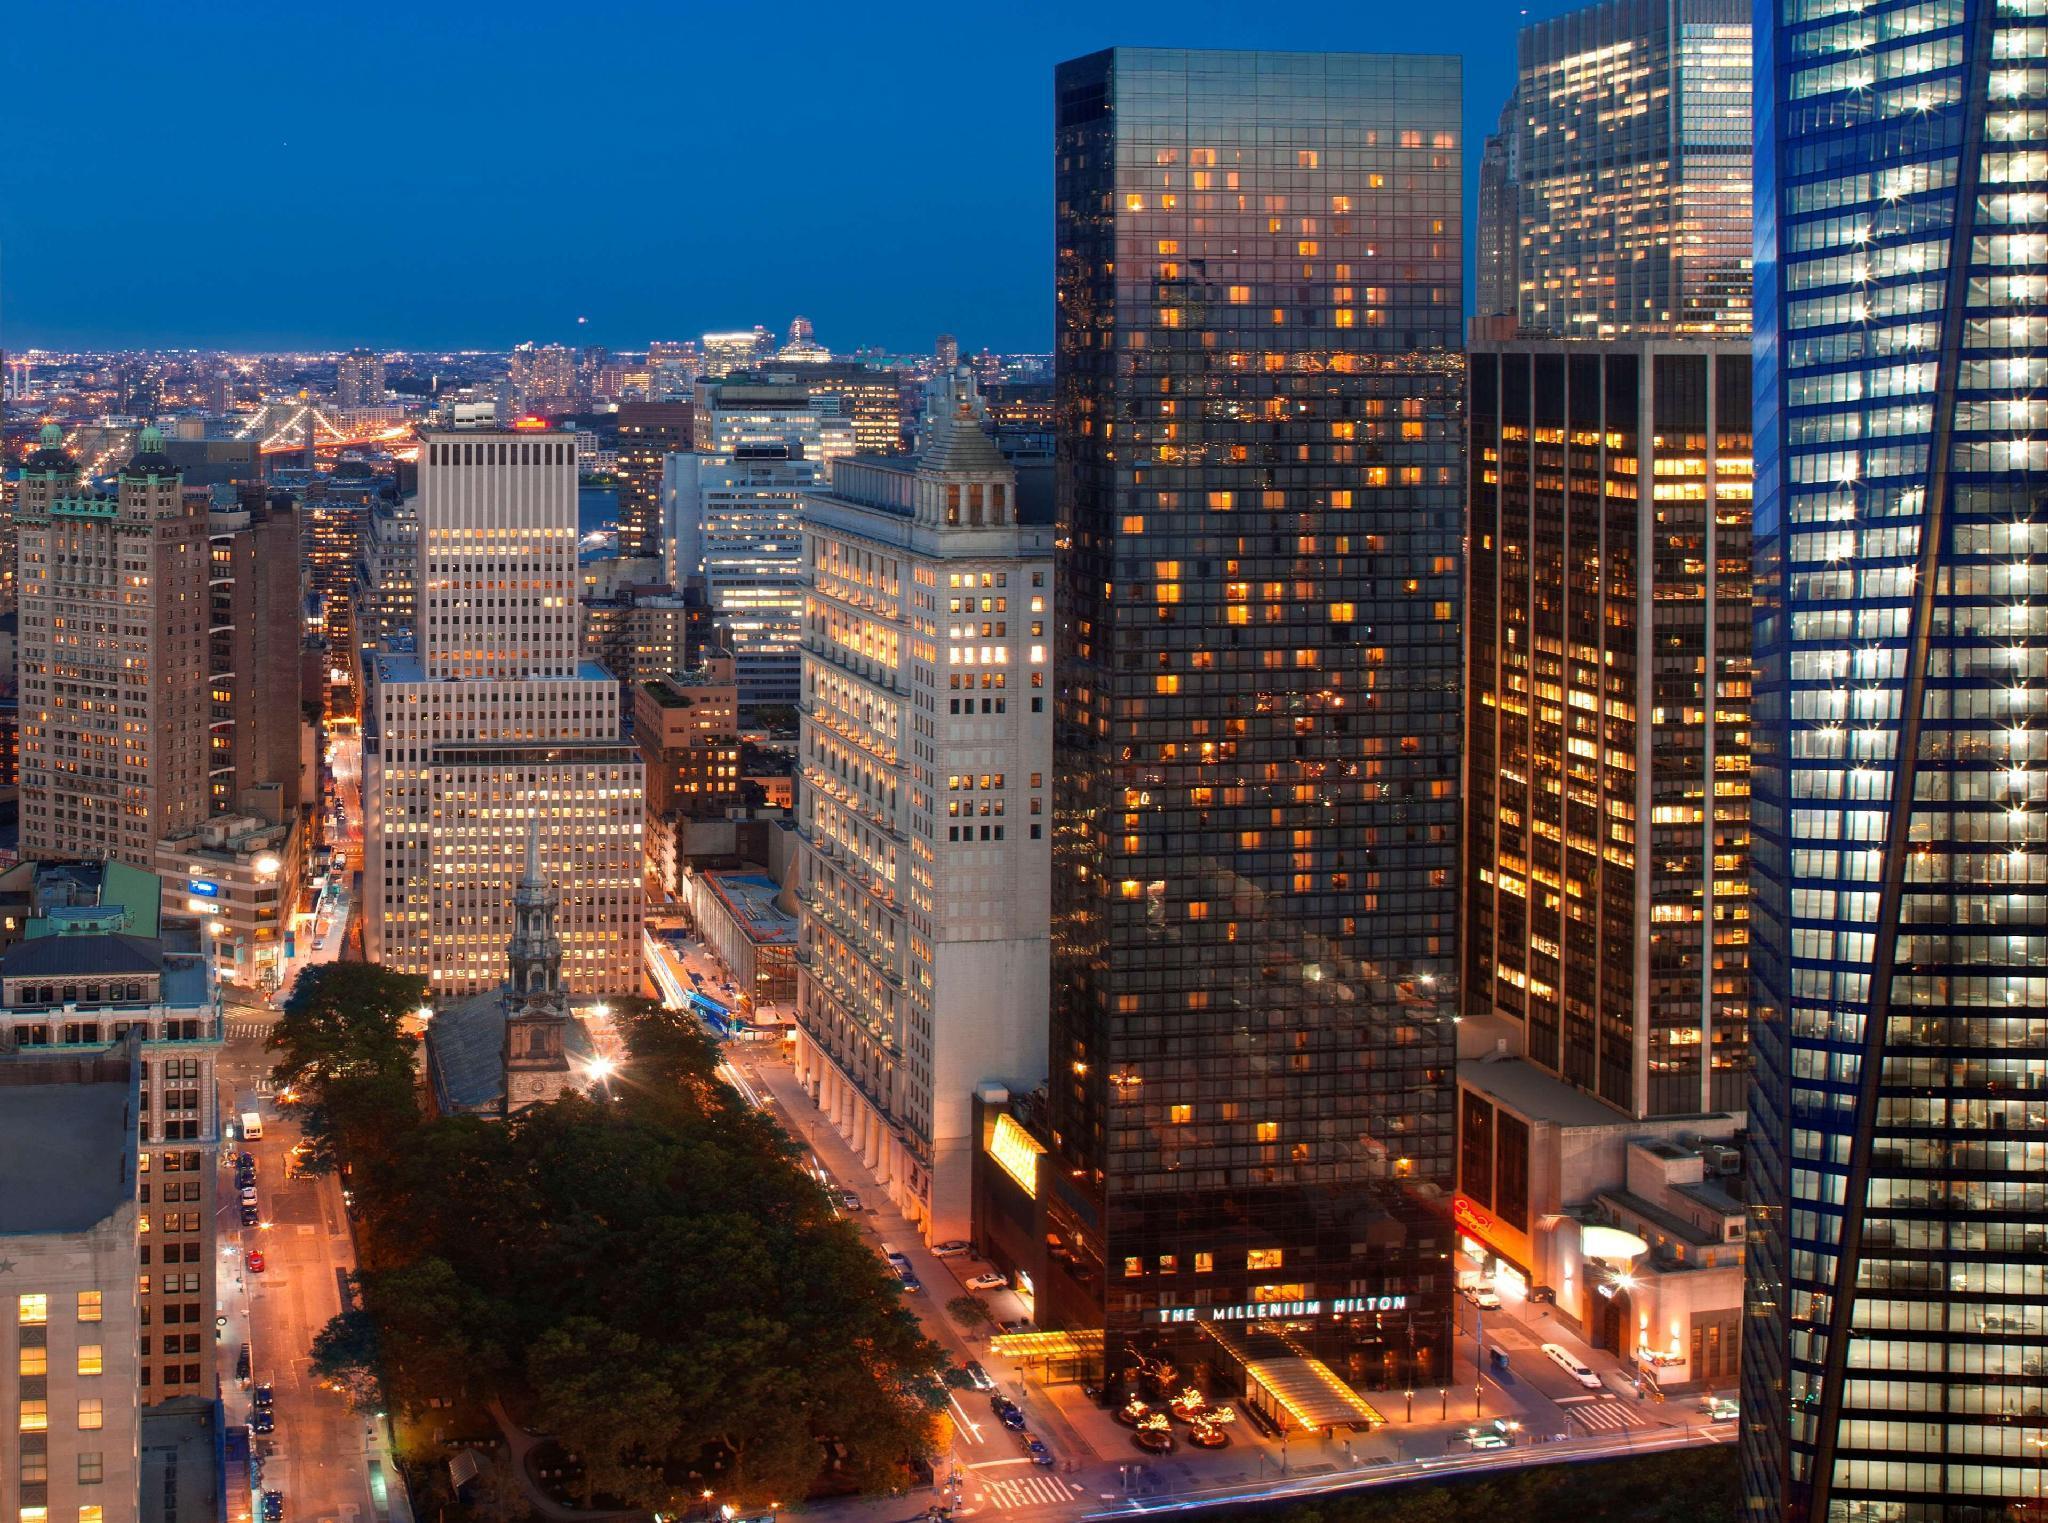 Millennium Hilton New York Downtown image